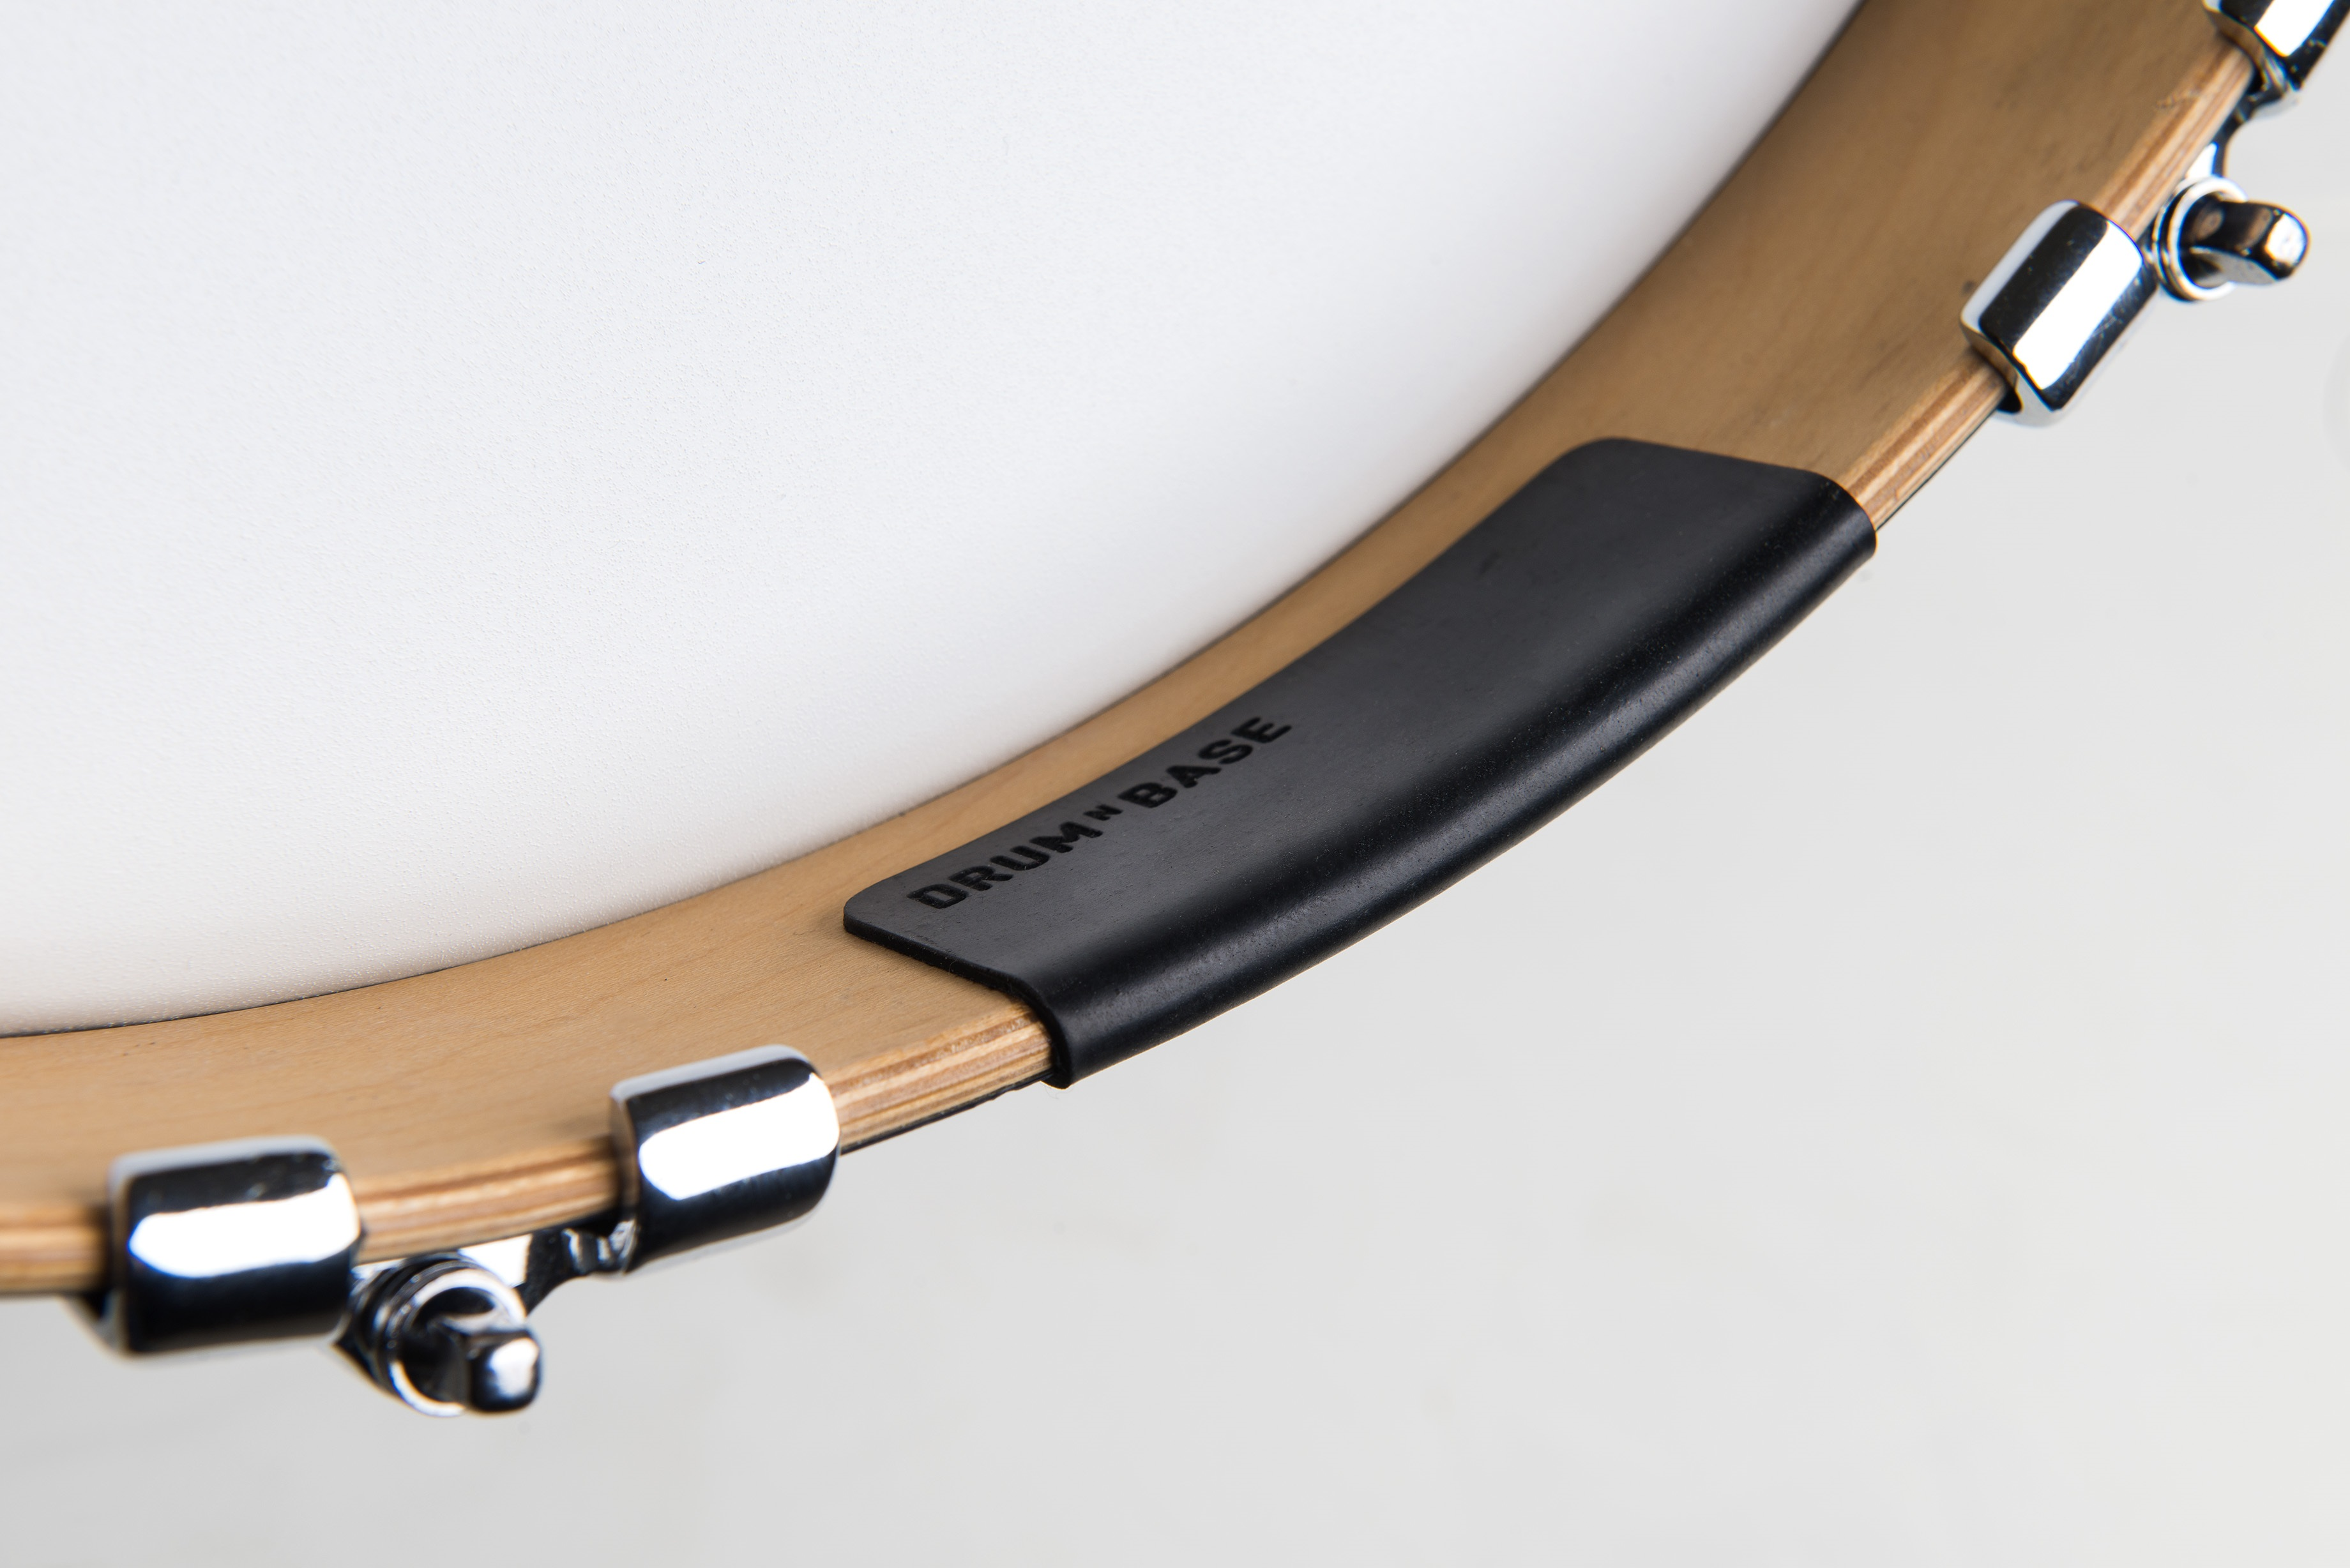 drumnbase launches hoop protect 180 drumnbasedrumnbase. Black Bedroom Furniture Sets. Home Design Ideas